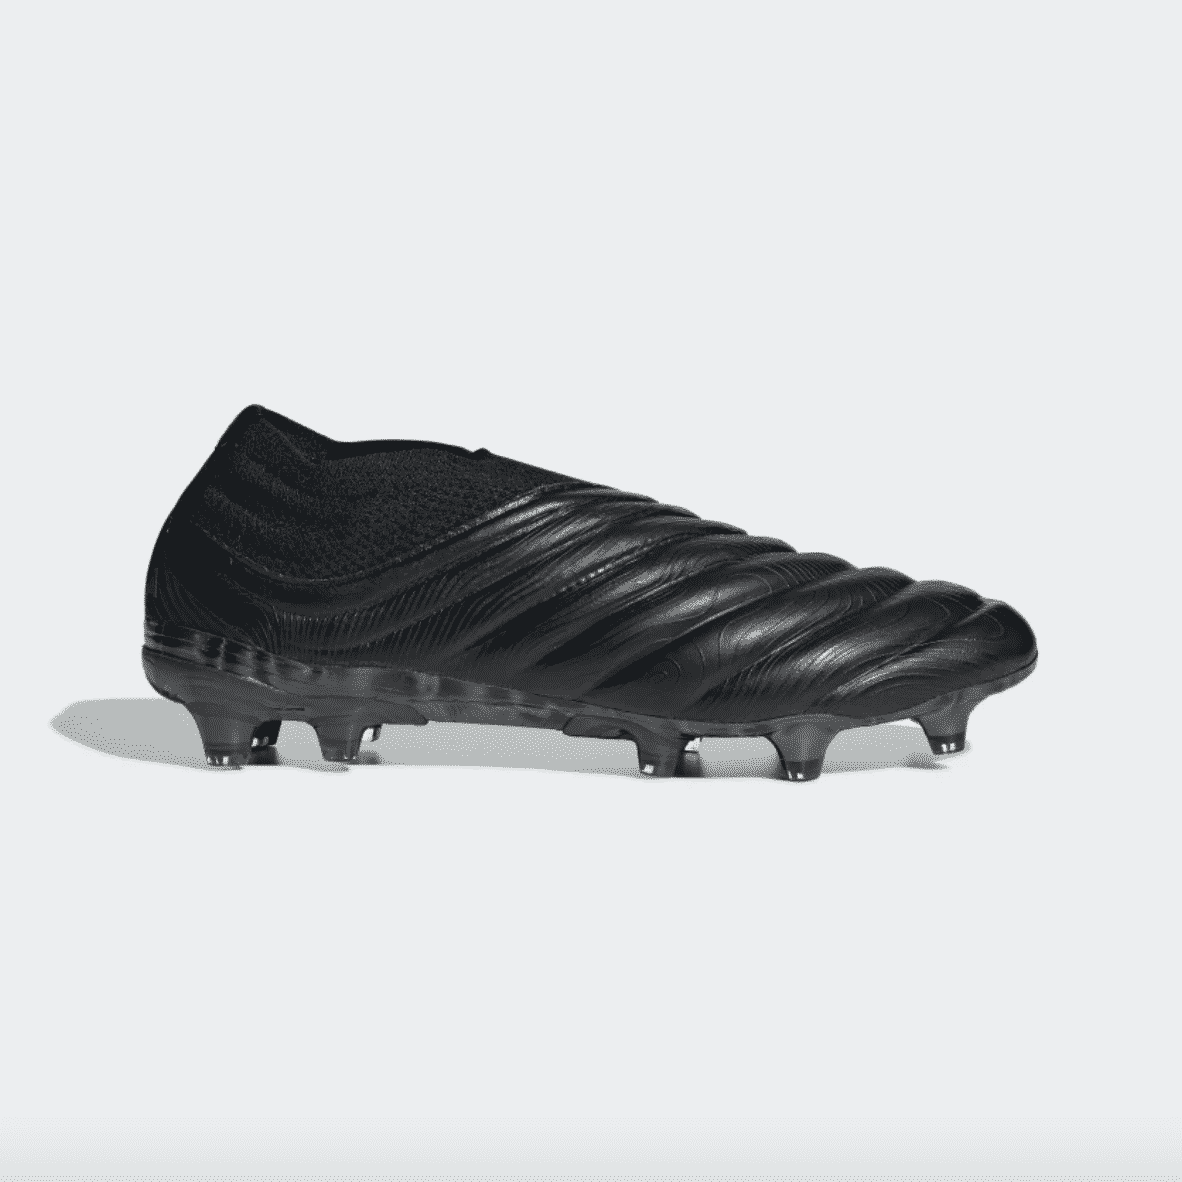 adidas-copa-shadowbeast-janvier-2020-1